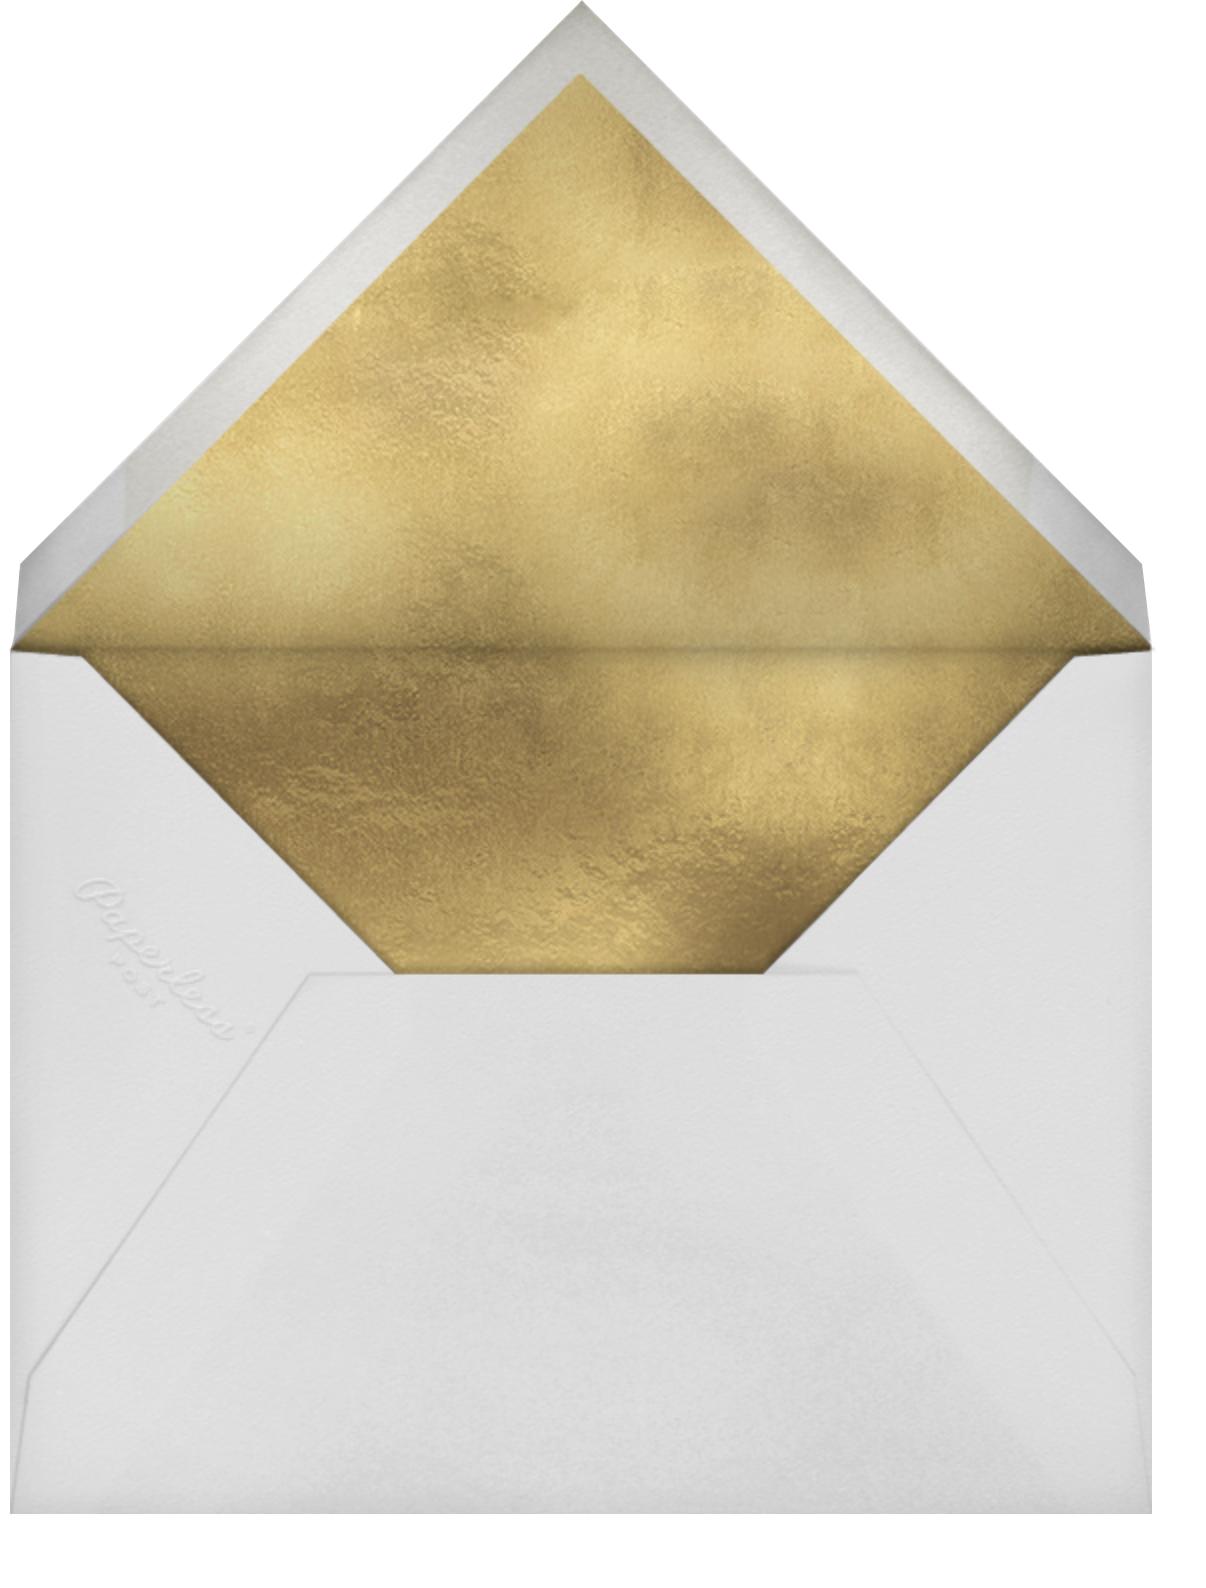 Stamped Greenery - Navy - Oscar de la Renta - Envelope